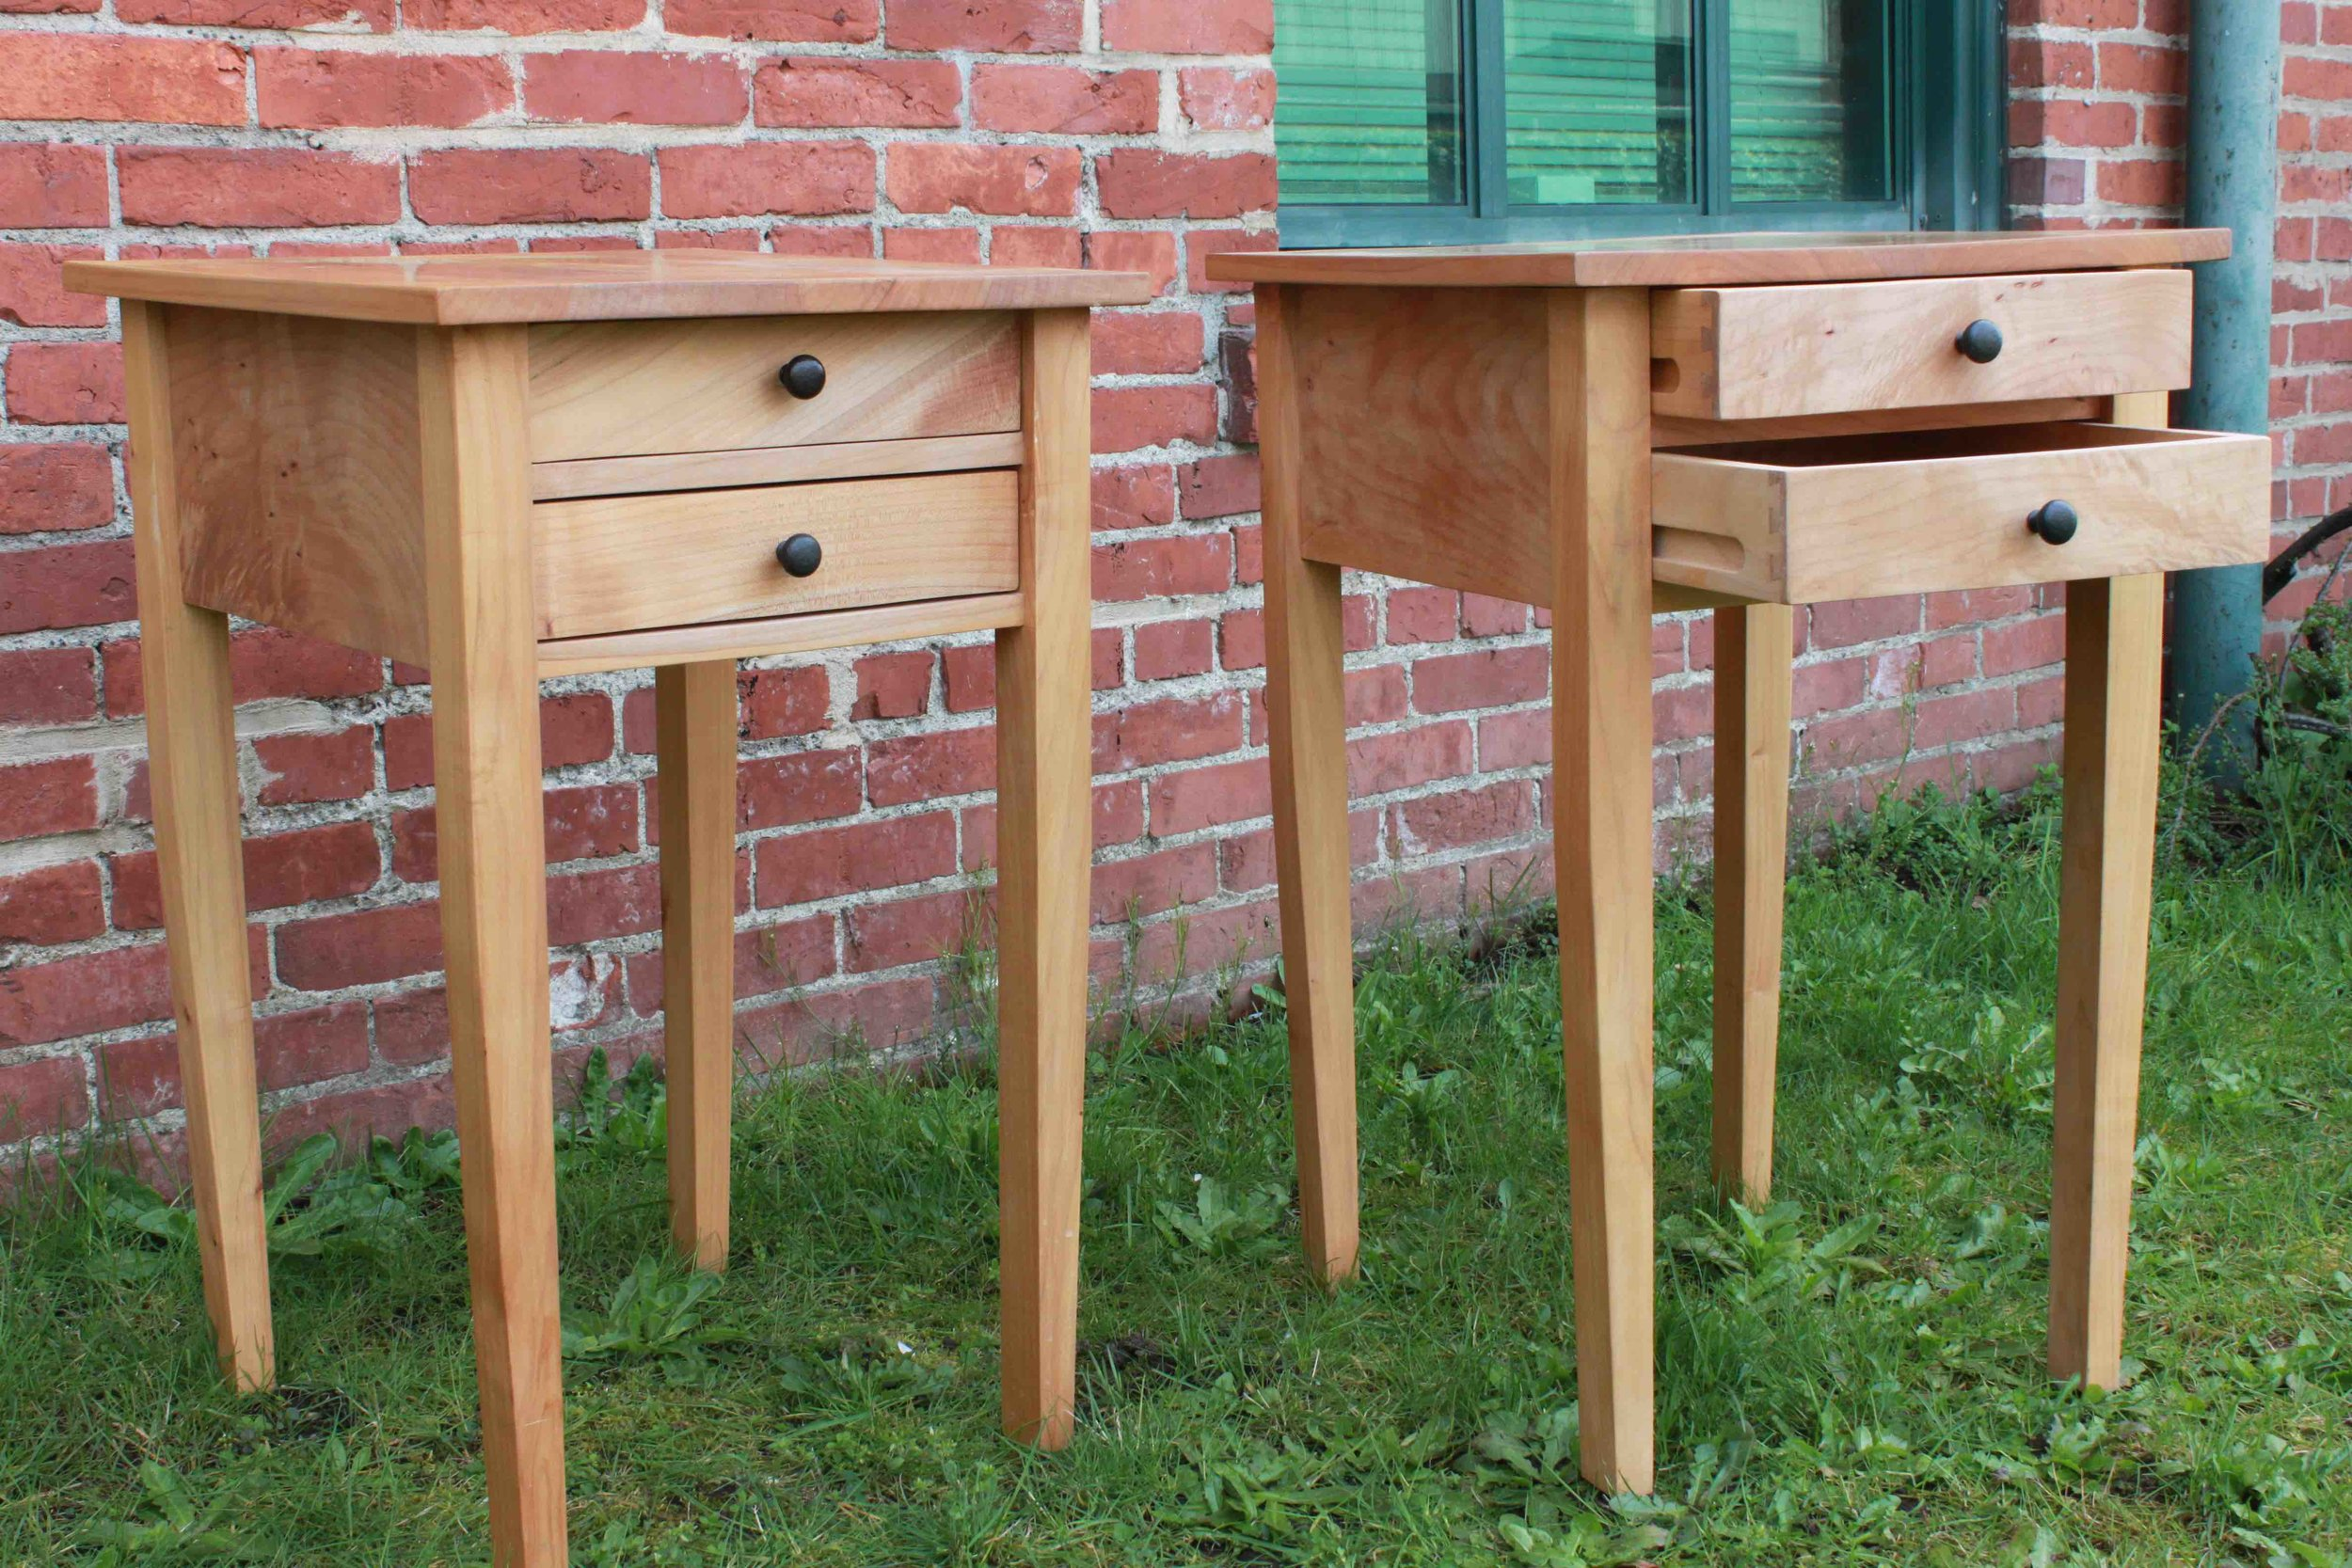 Maple Bed Tables.drawers ajar.jpg